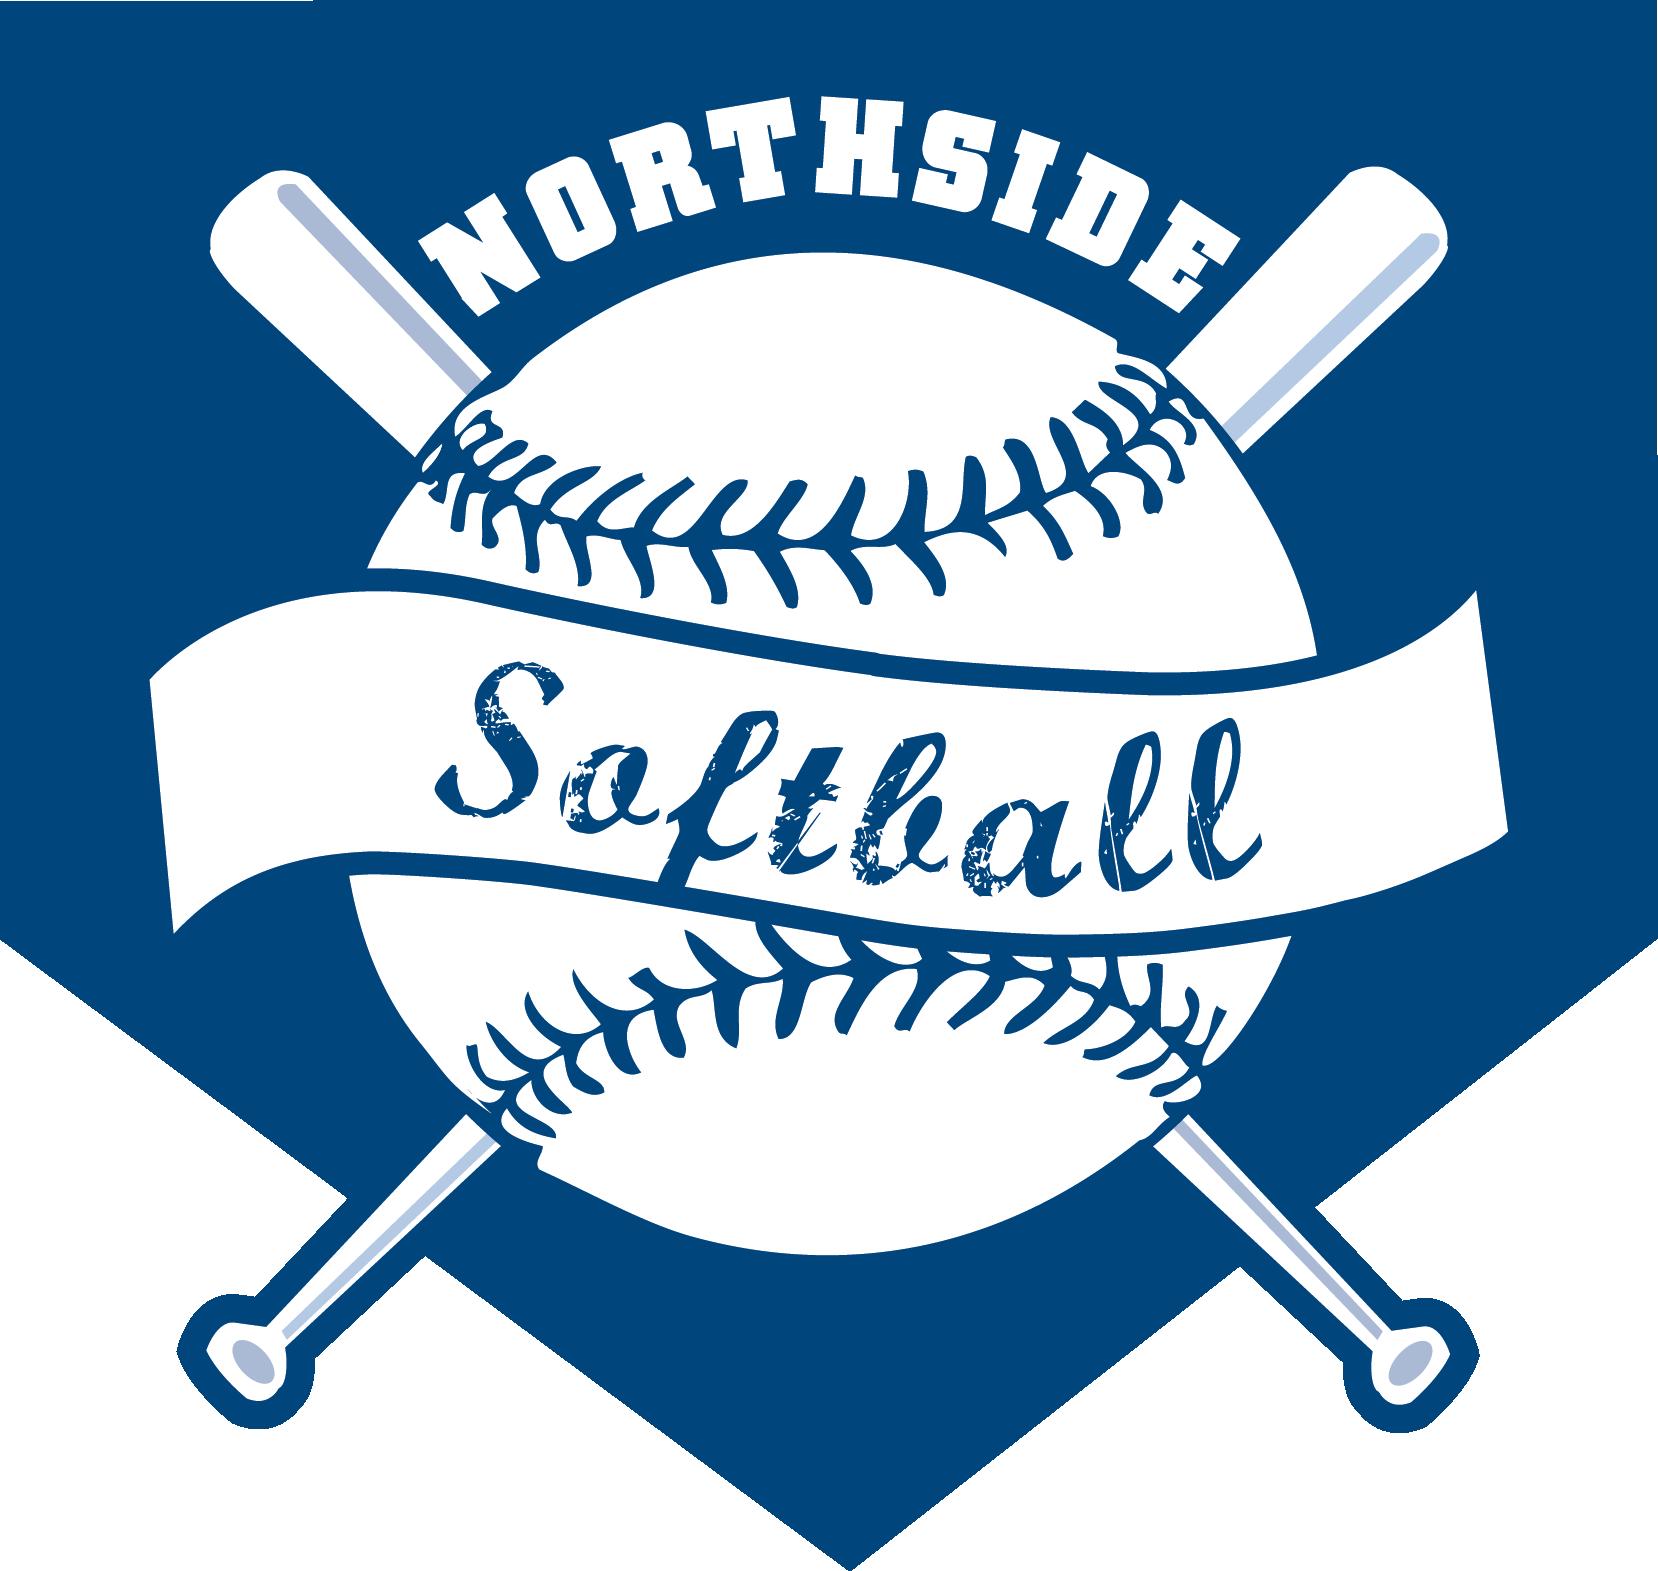 softball logos ph 404 367 2370 ministers softball pinterest rh pinterest com softball logo pics